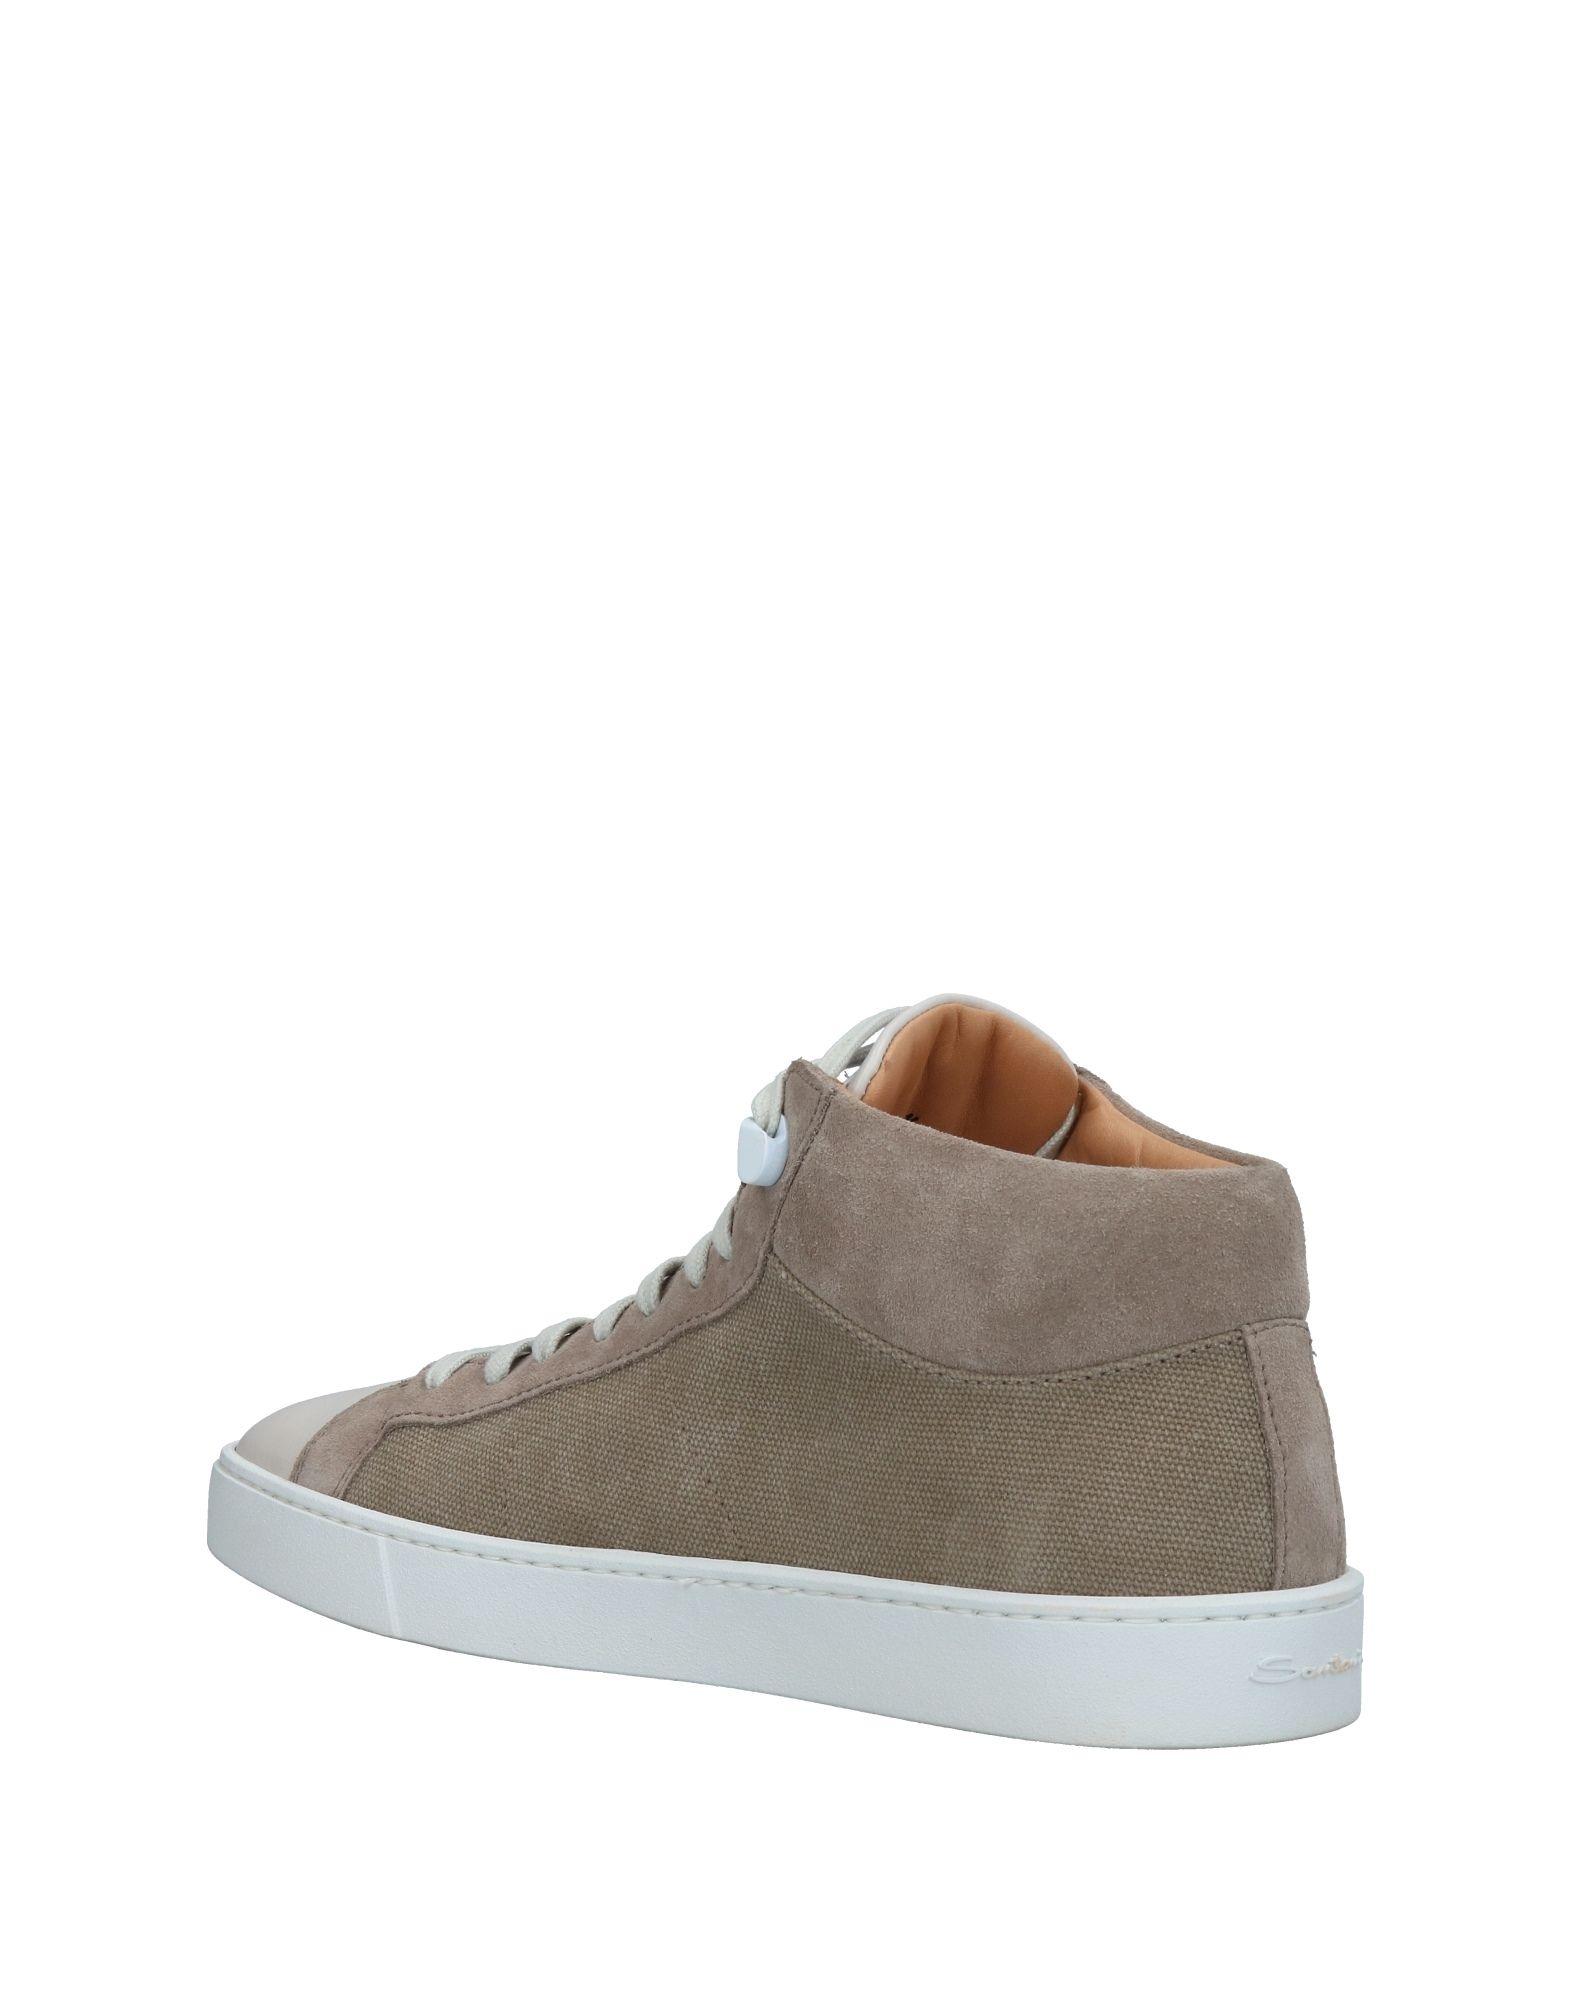 Santoni Sneakers Herren  11410767IB Heiße Schuhe 3da01a